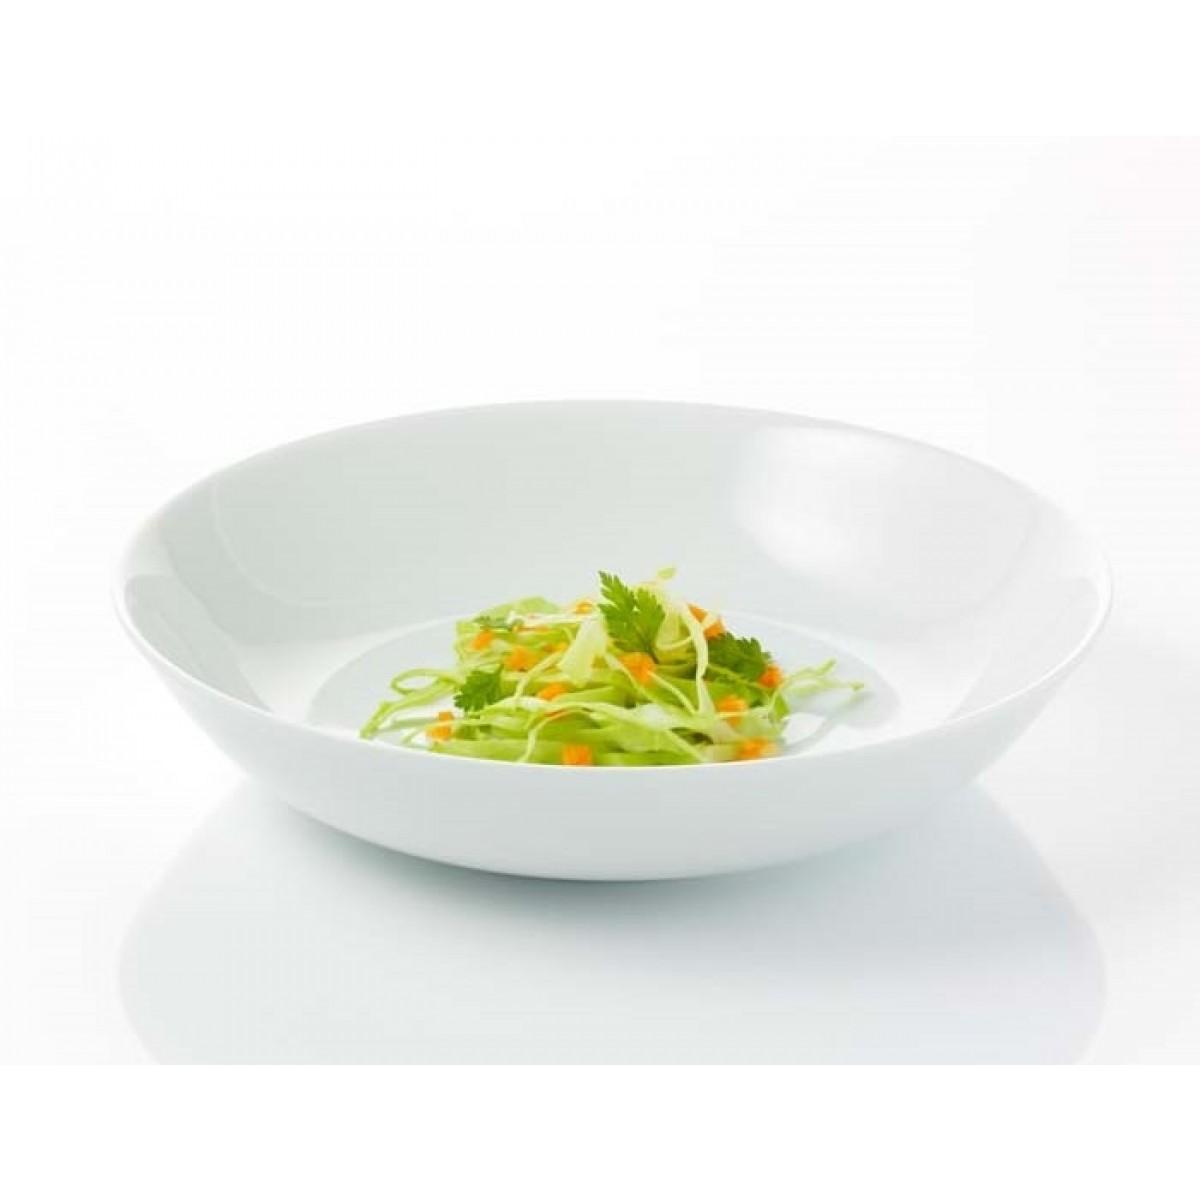 AIDA Atelier hvid suppetallerken 4 stk. 21 cm.